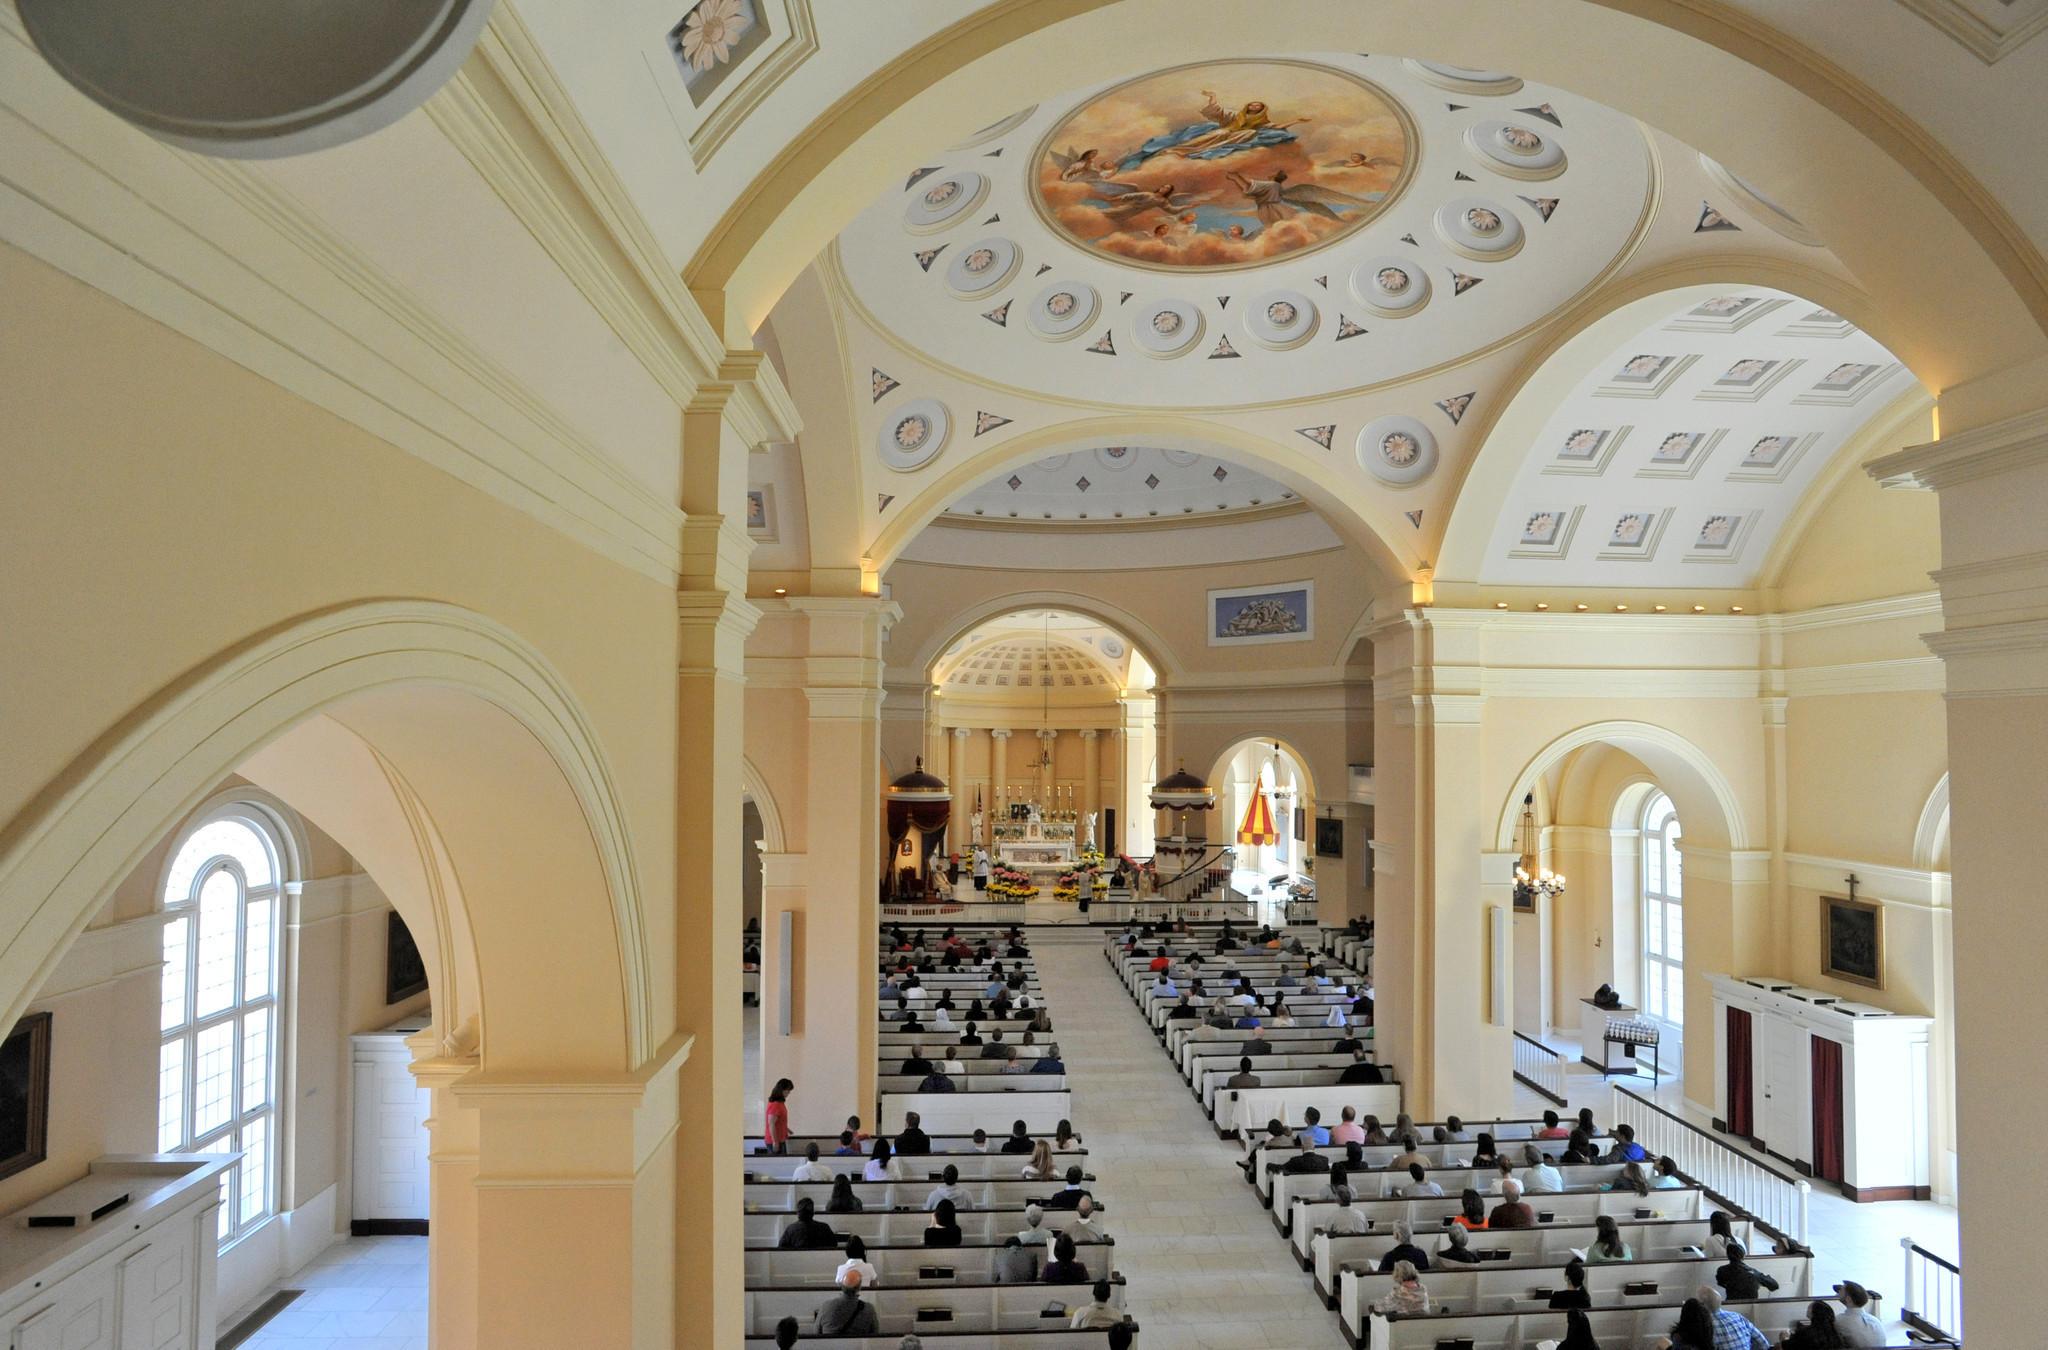 At St  Alphonsus Ligouri in Baltimore, believers find new